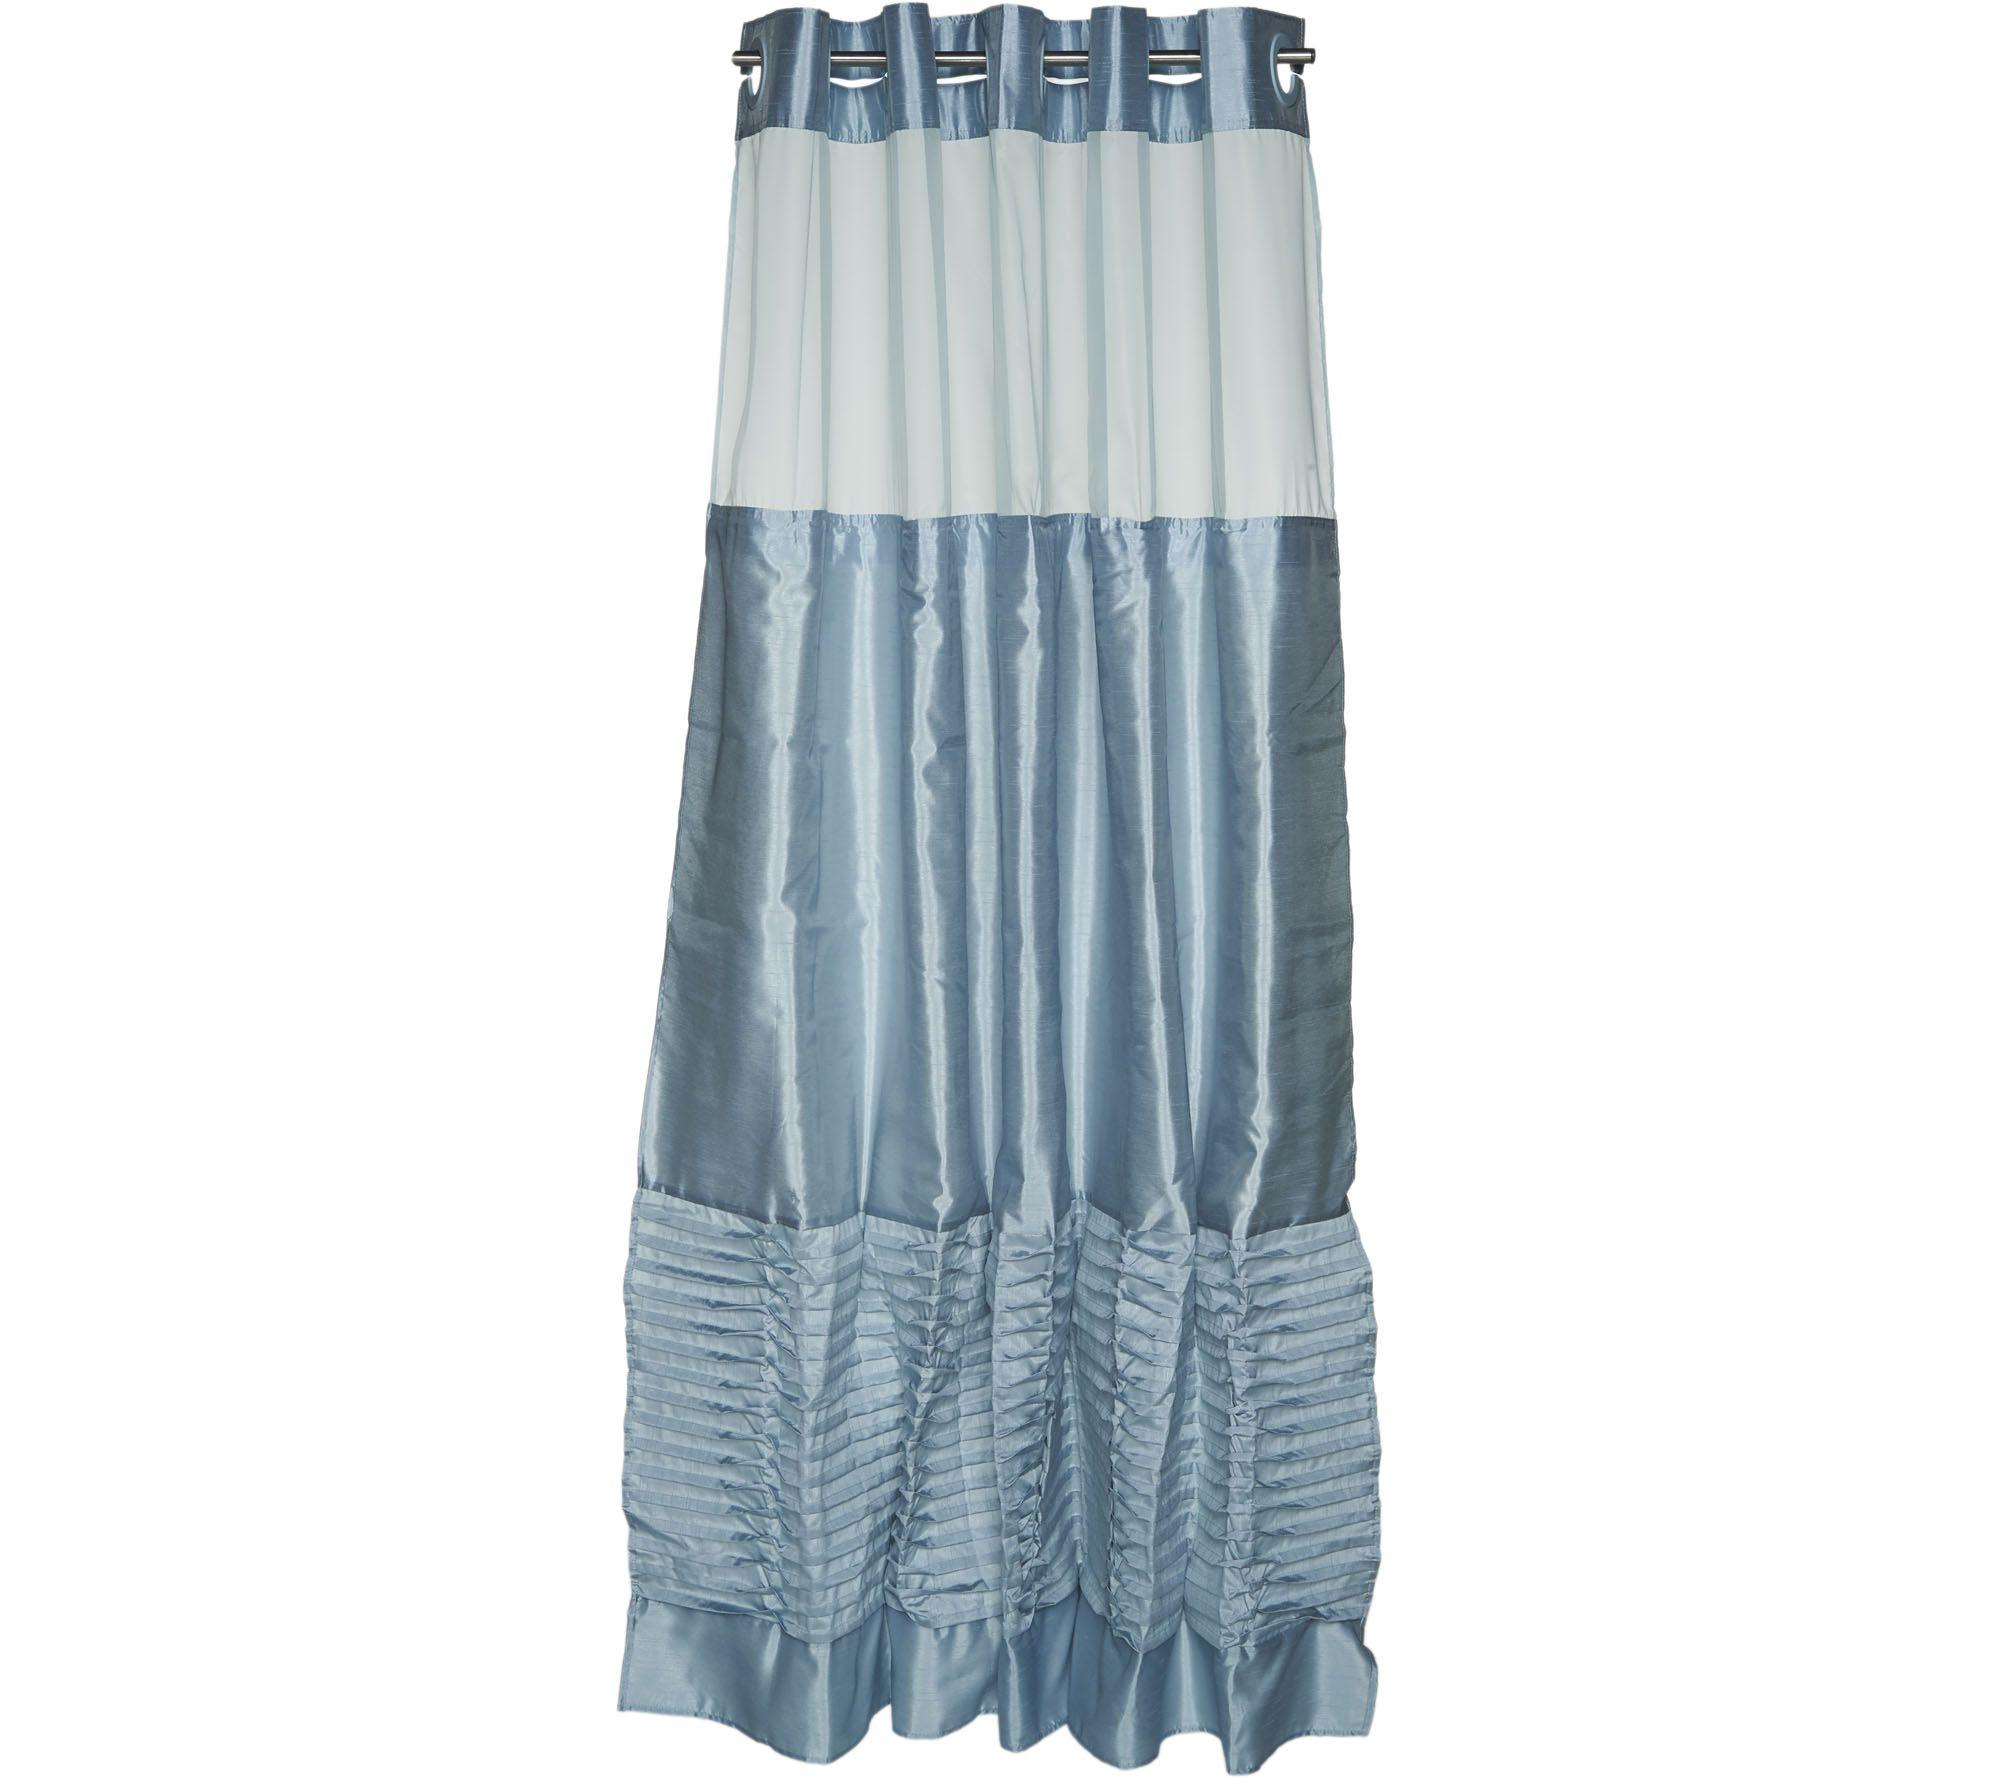 Shower Curtains Bath For the Home QVCcom